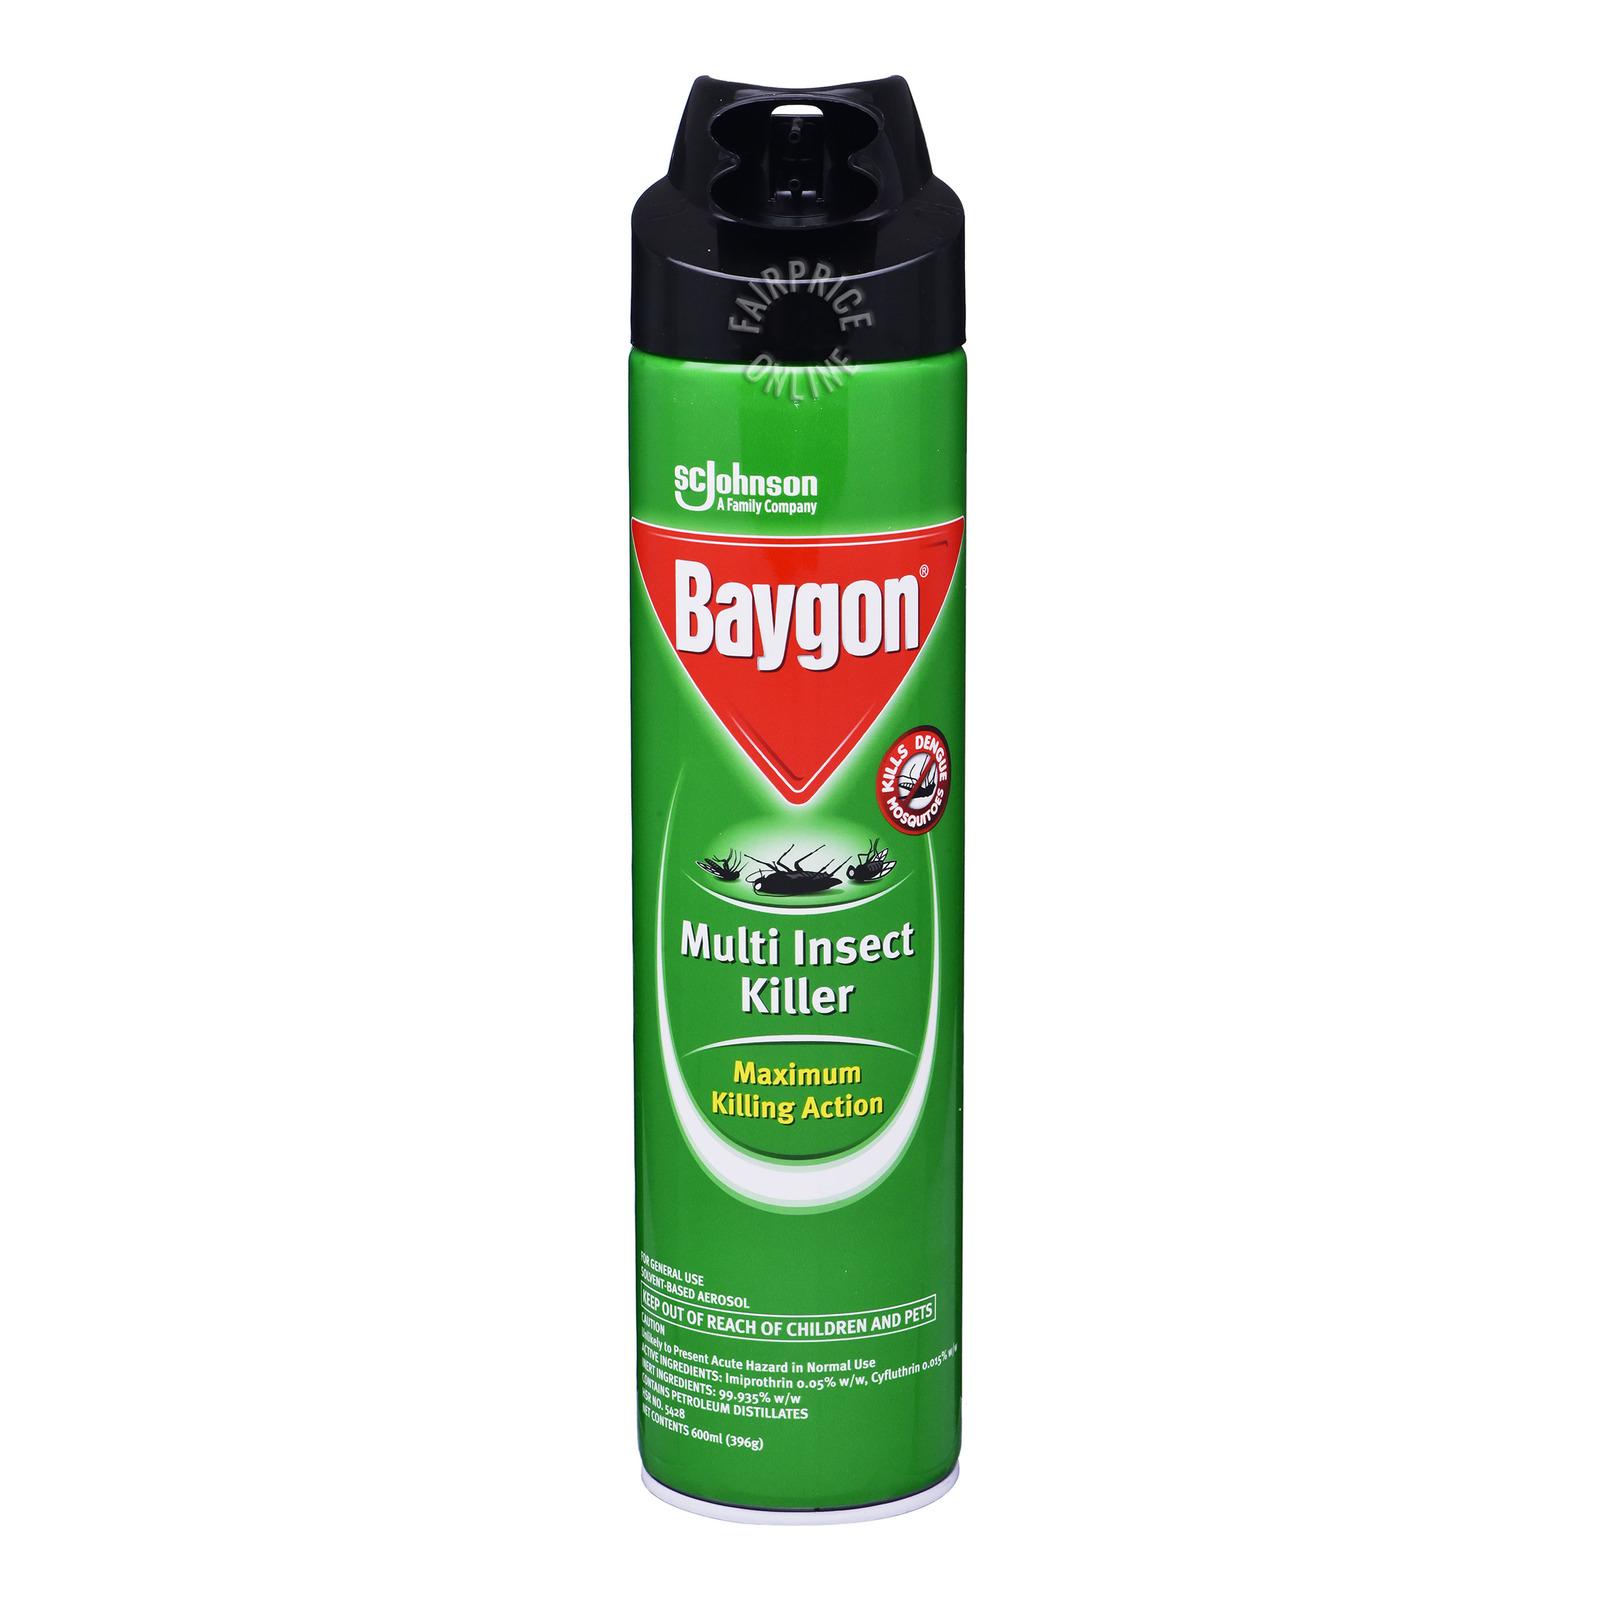 Baygon Multi Insect Killer - Maximum Killing Action